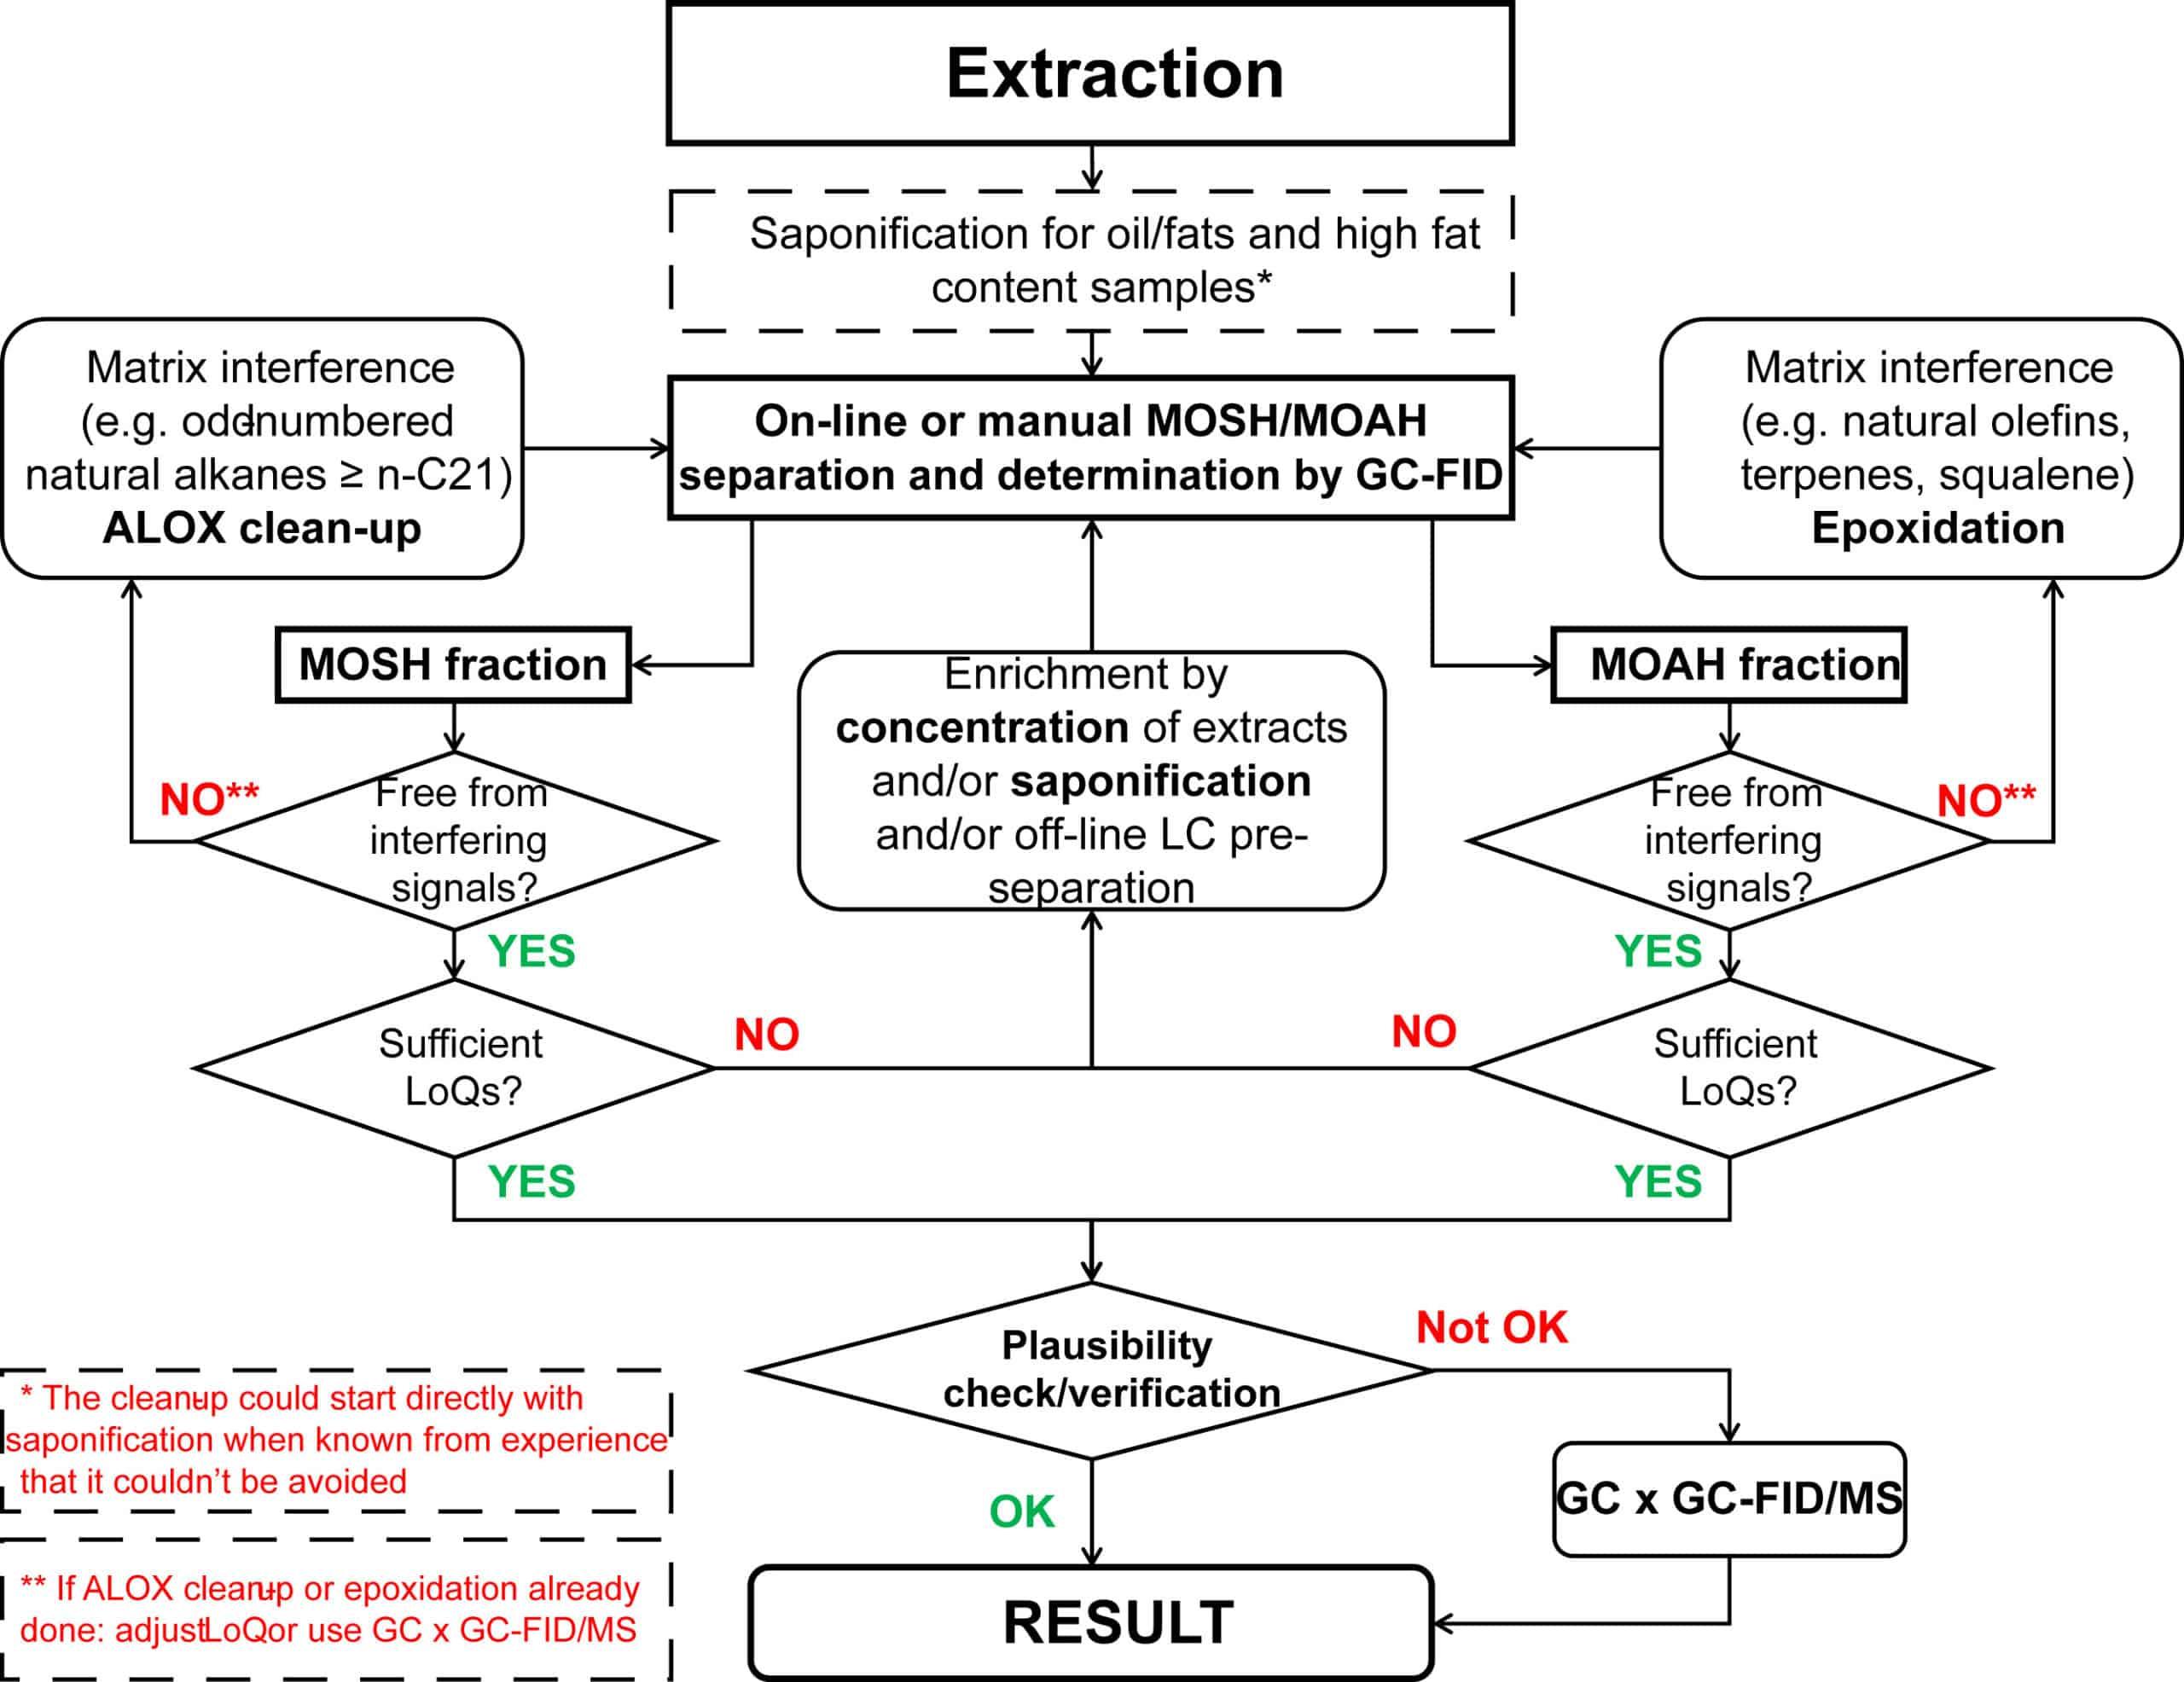 Fig. 4. Decision tree to identify auxilary methods. Adapted from Bratinova & Hoekstra, 2019. ALOX: Al2O3.